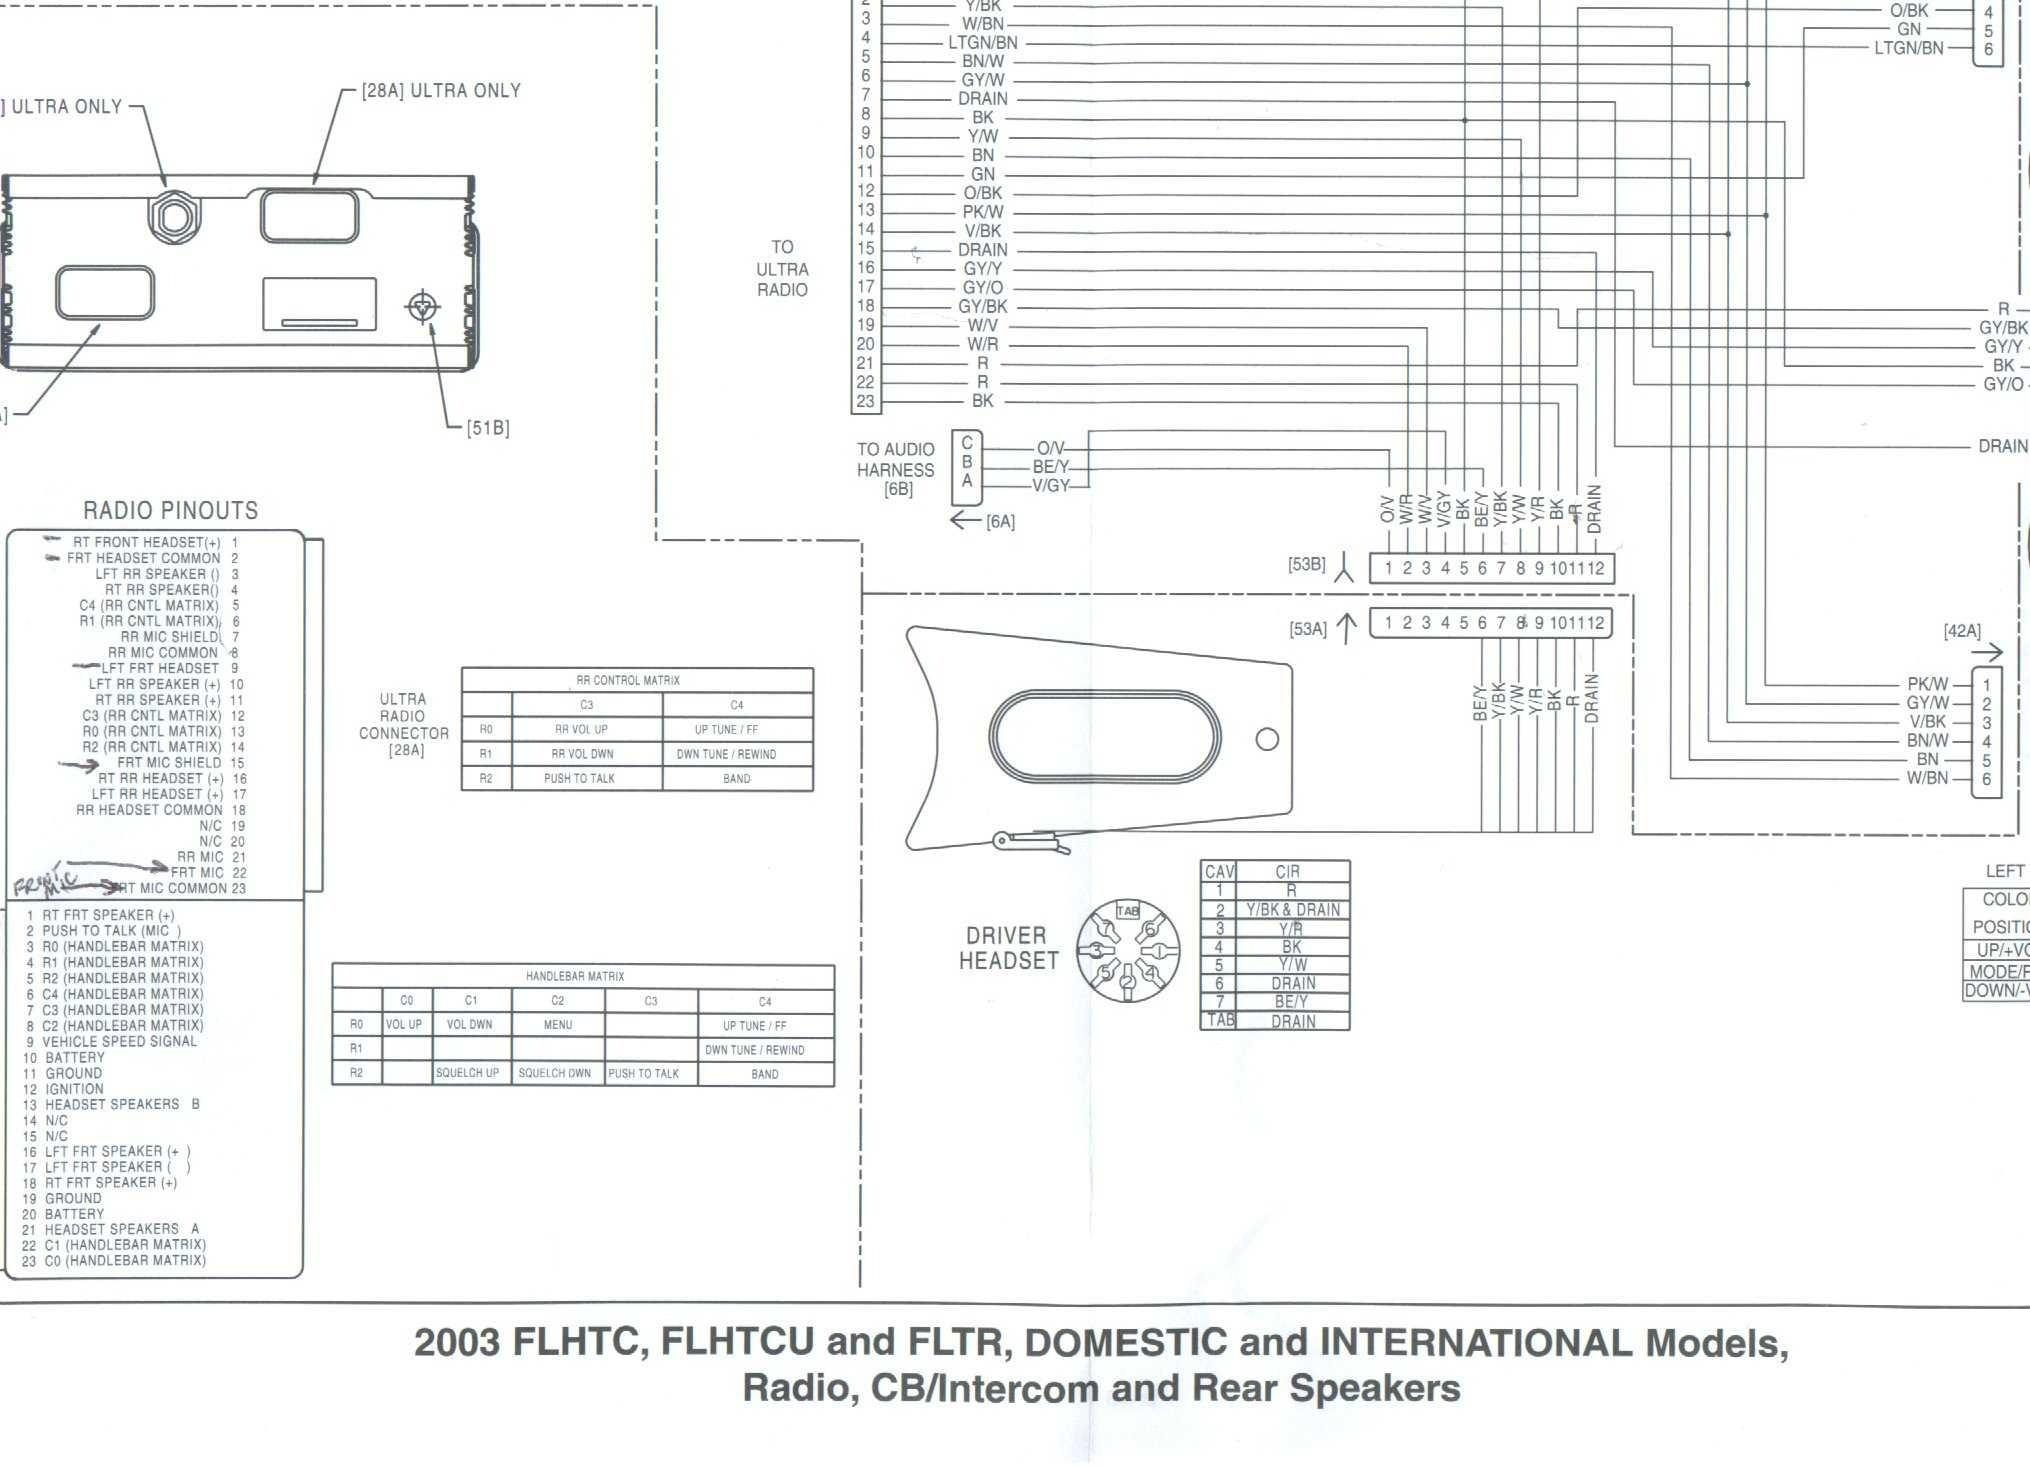 Radio Wire Diagram Inspirational Cb Radio Wiring Diagram Gm Colors Harley Davidson Sportster Wiring Diagram